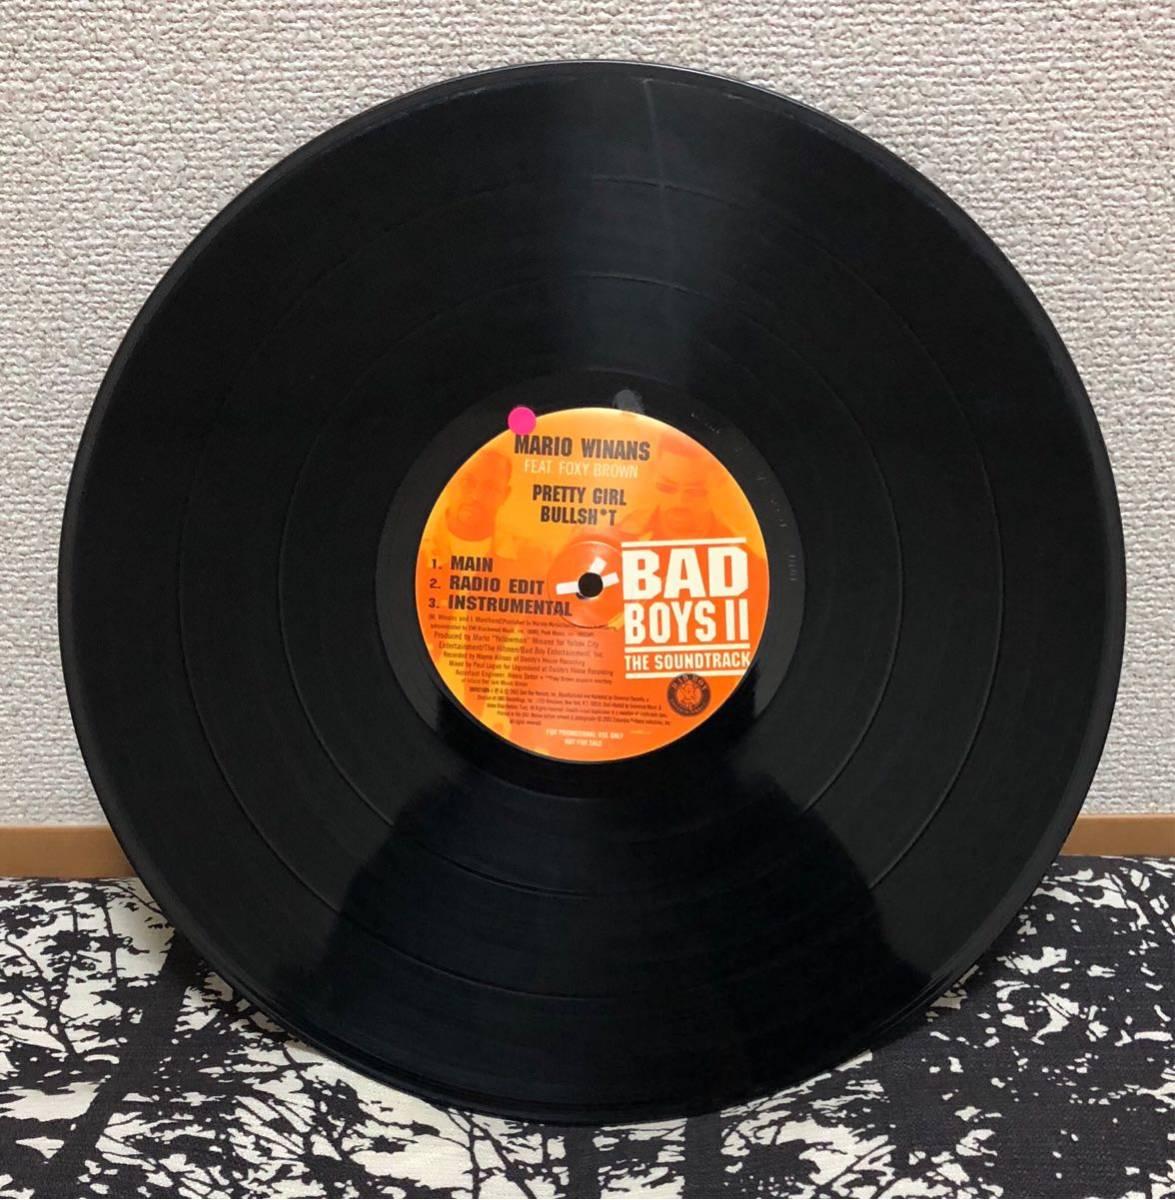 Bad Boys II Jay-Z Lalala バッドボーイズ ジェイジー 12inch レコード 激レア 廃盤 ヒップホップ アルバム クラブ ダンス_画像3